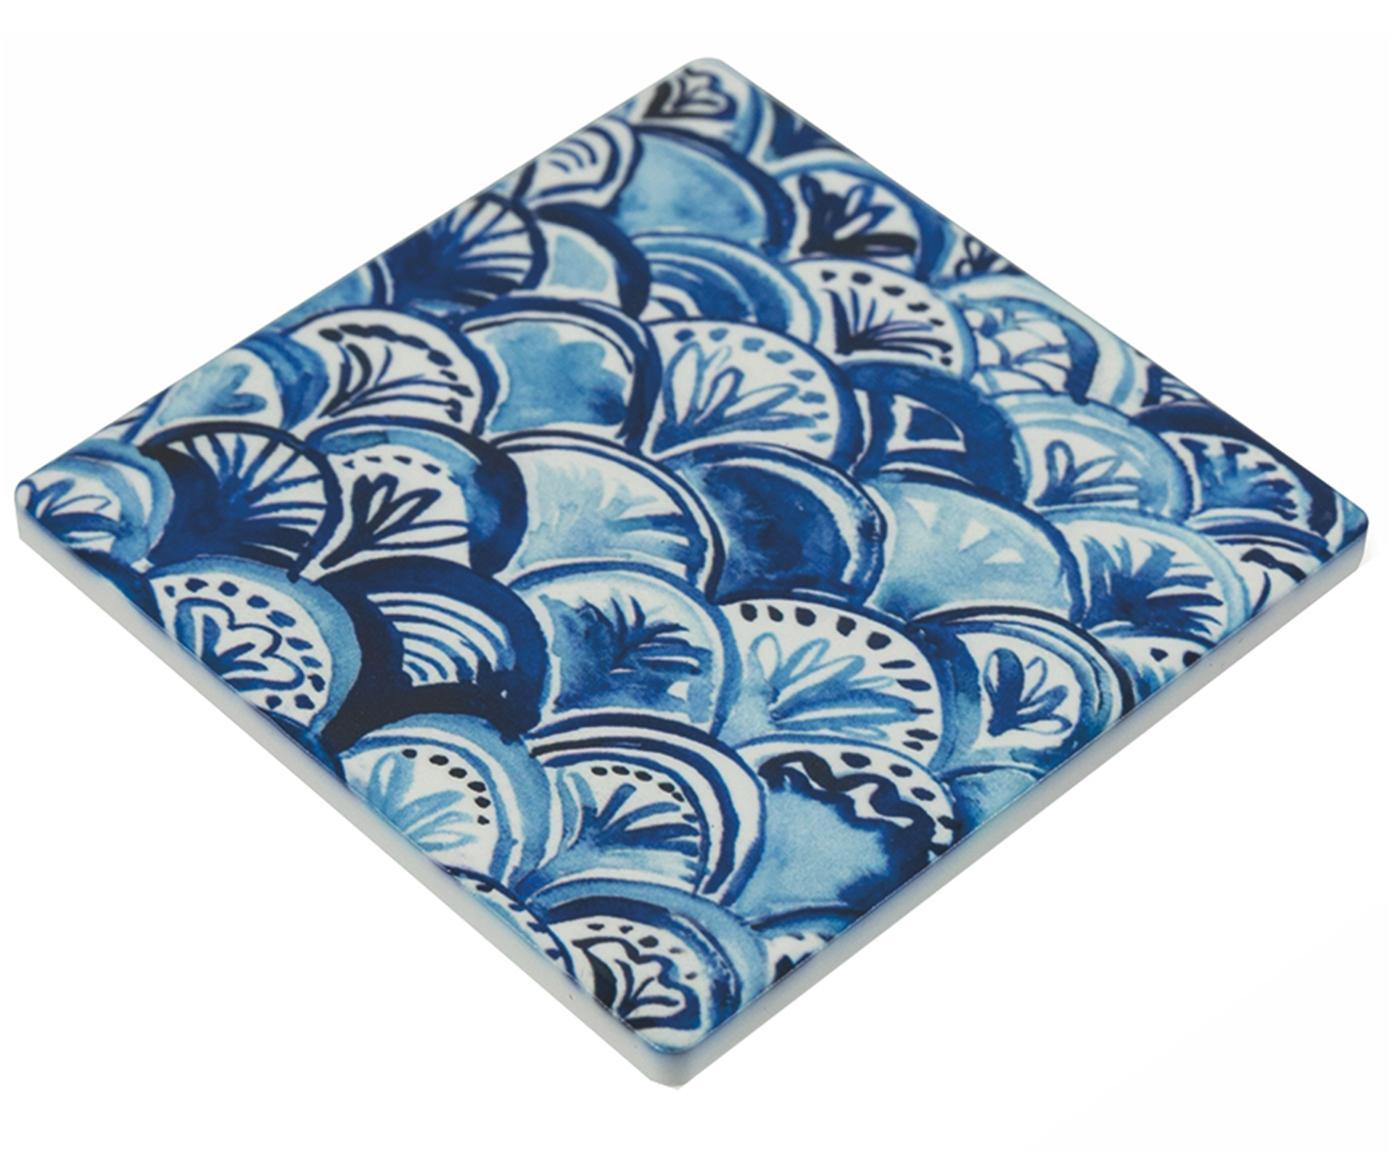 Komplet podstawek Vas, 3 elem., Ceramika, Niebieski, S 10 x G 10 cm